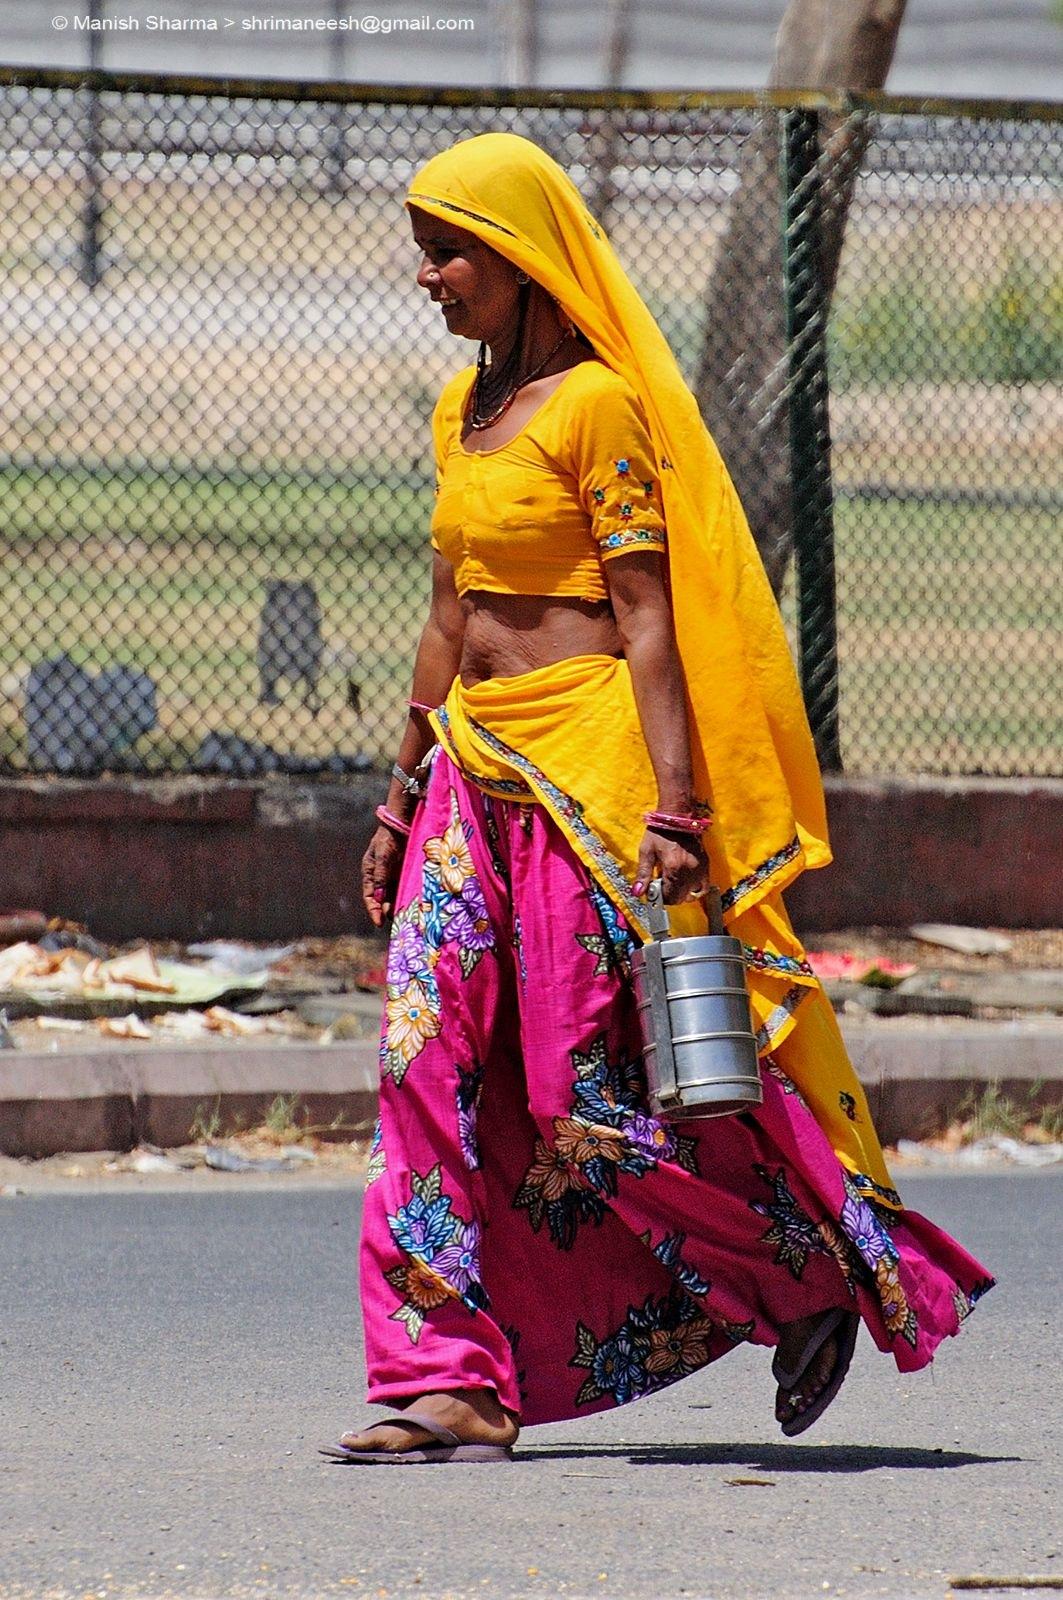 Rural life in India by Maneesh Sharma